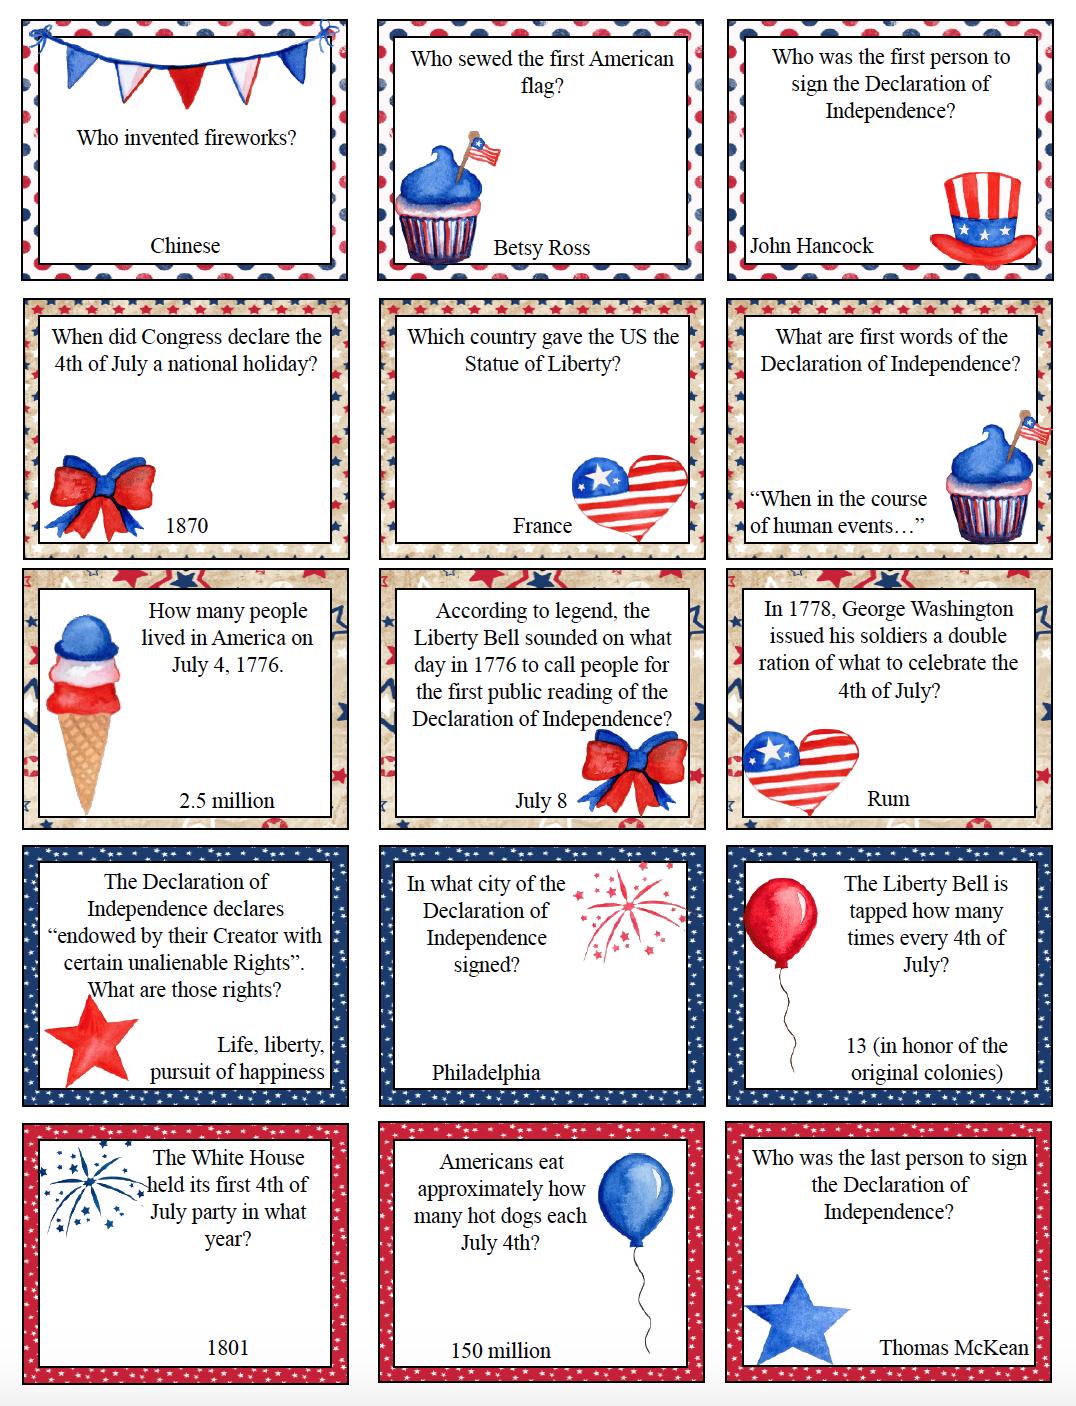 Free Printable 4Th Of July Trivia - Free Printable 4Th Of July Trivia Questions And Answers